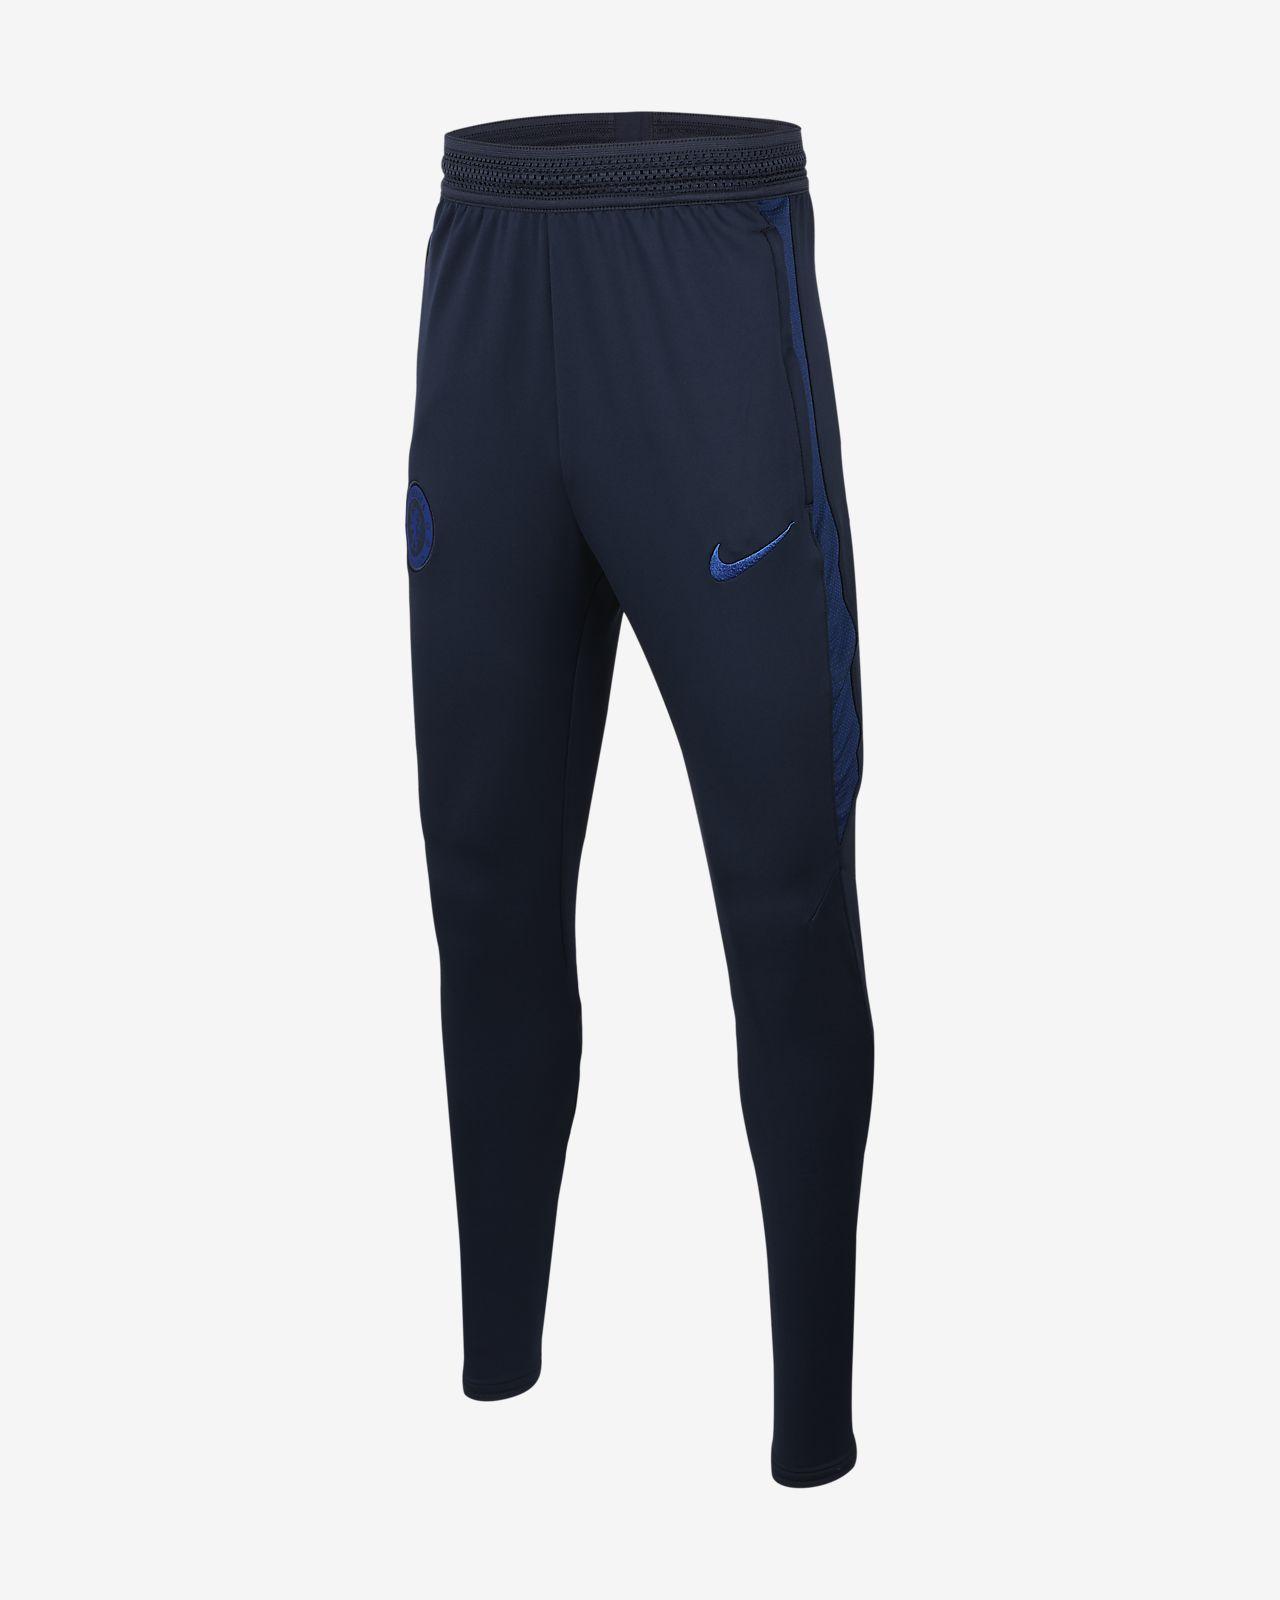 Nike Dri-FIT Chelsea FC Strike-fodboldbukser til børn